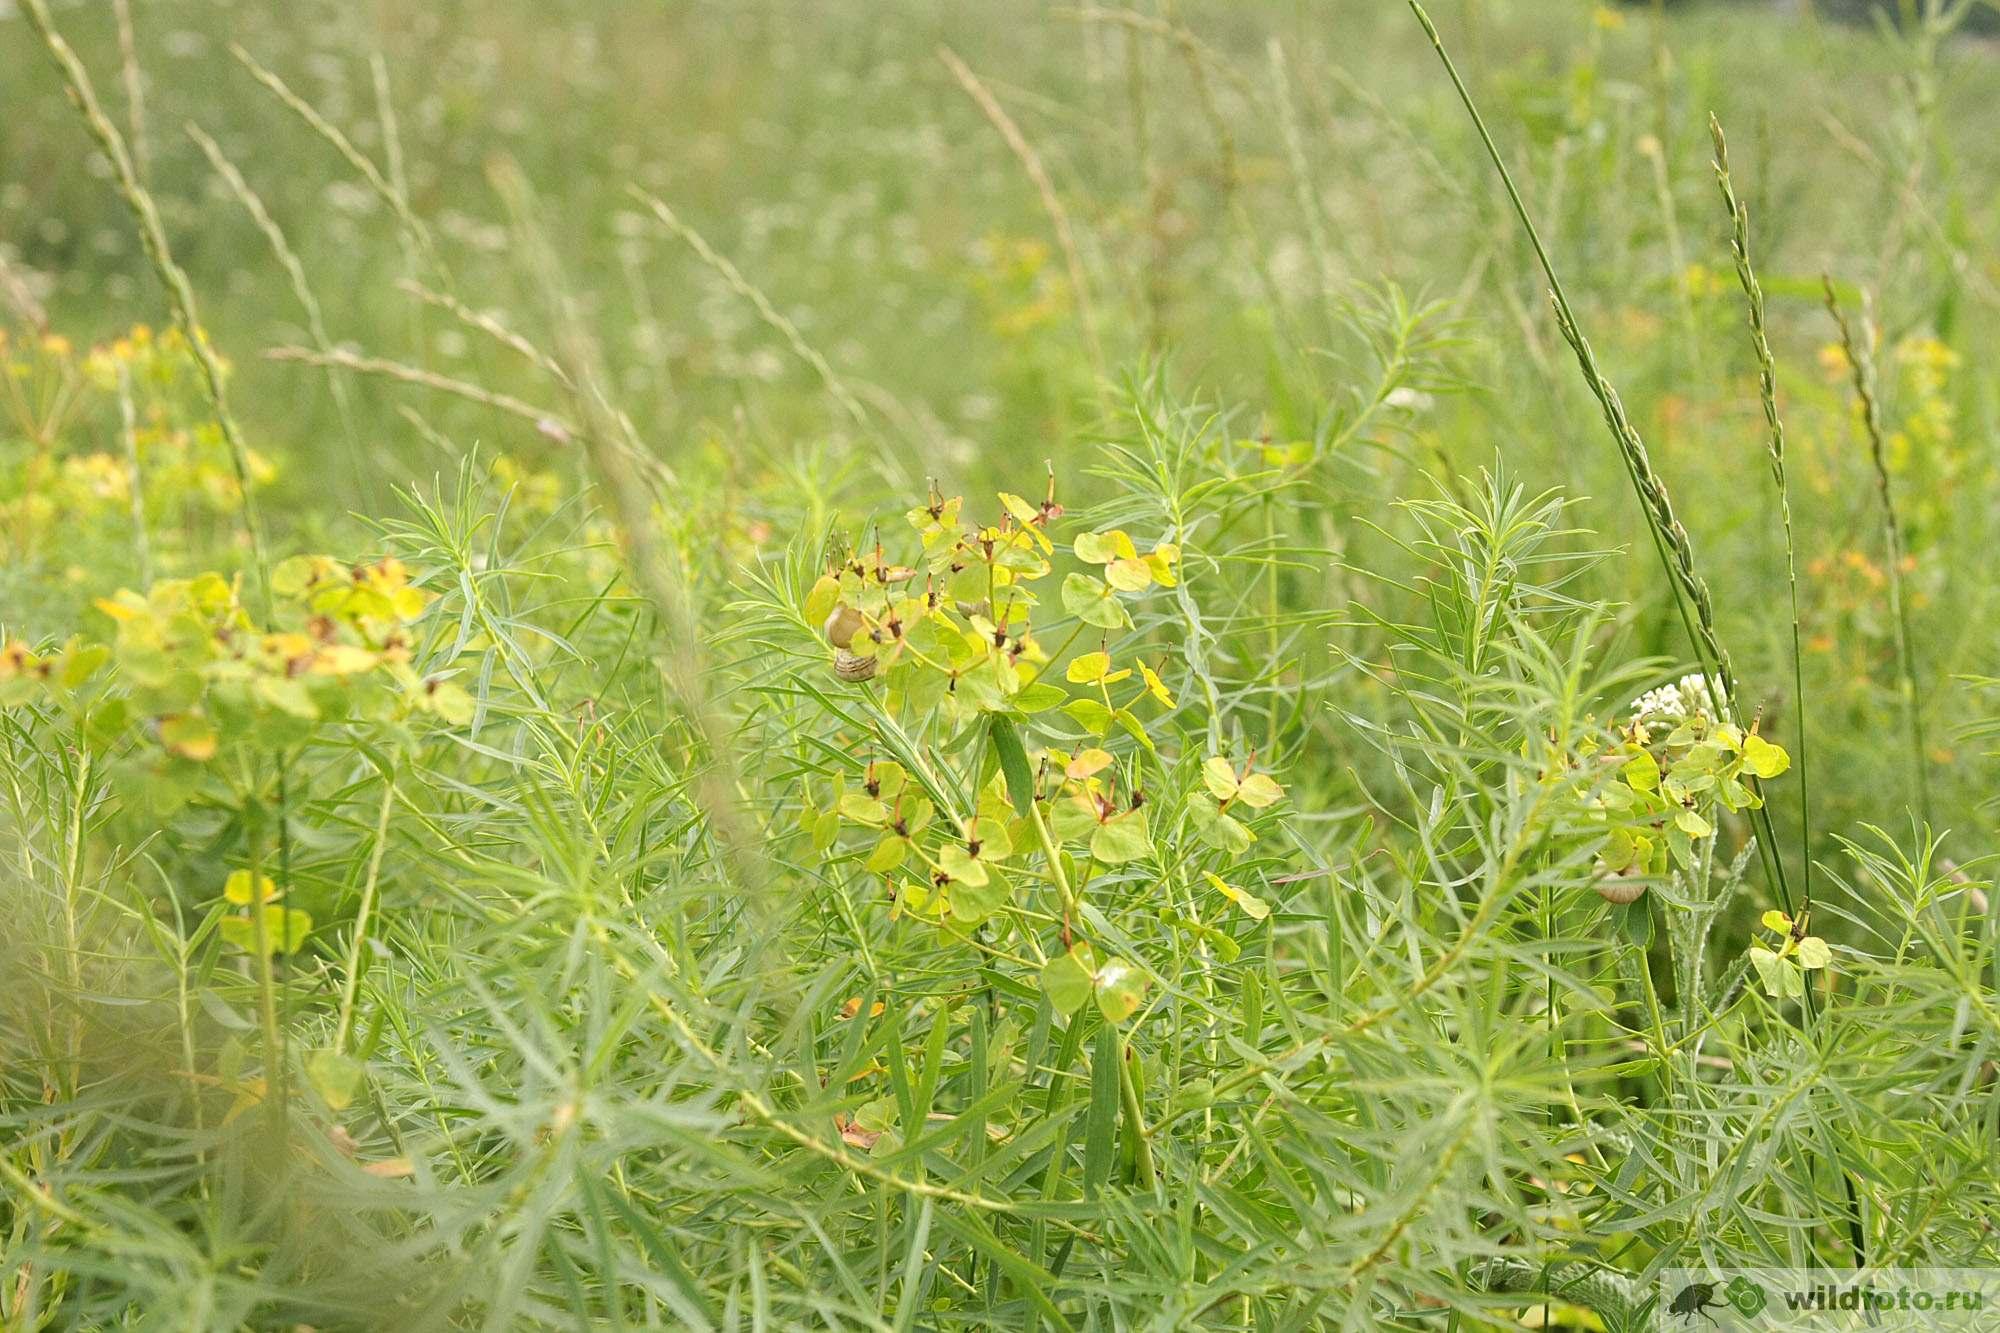 Молочай сорняк: 2 способа борьбы